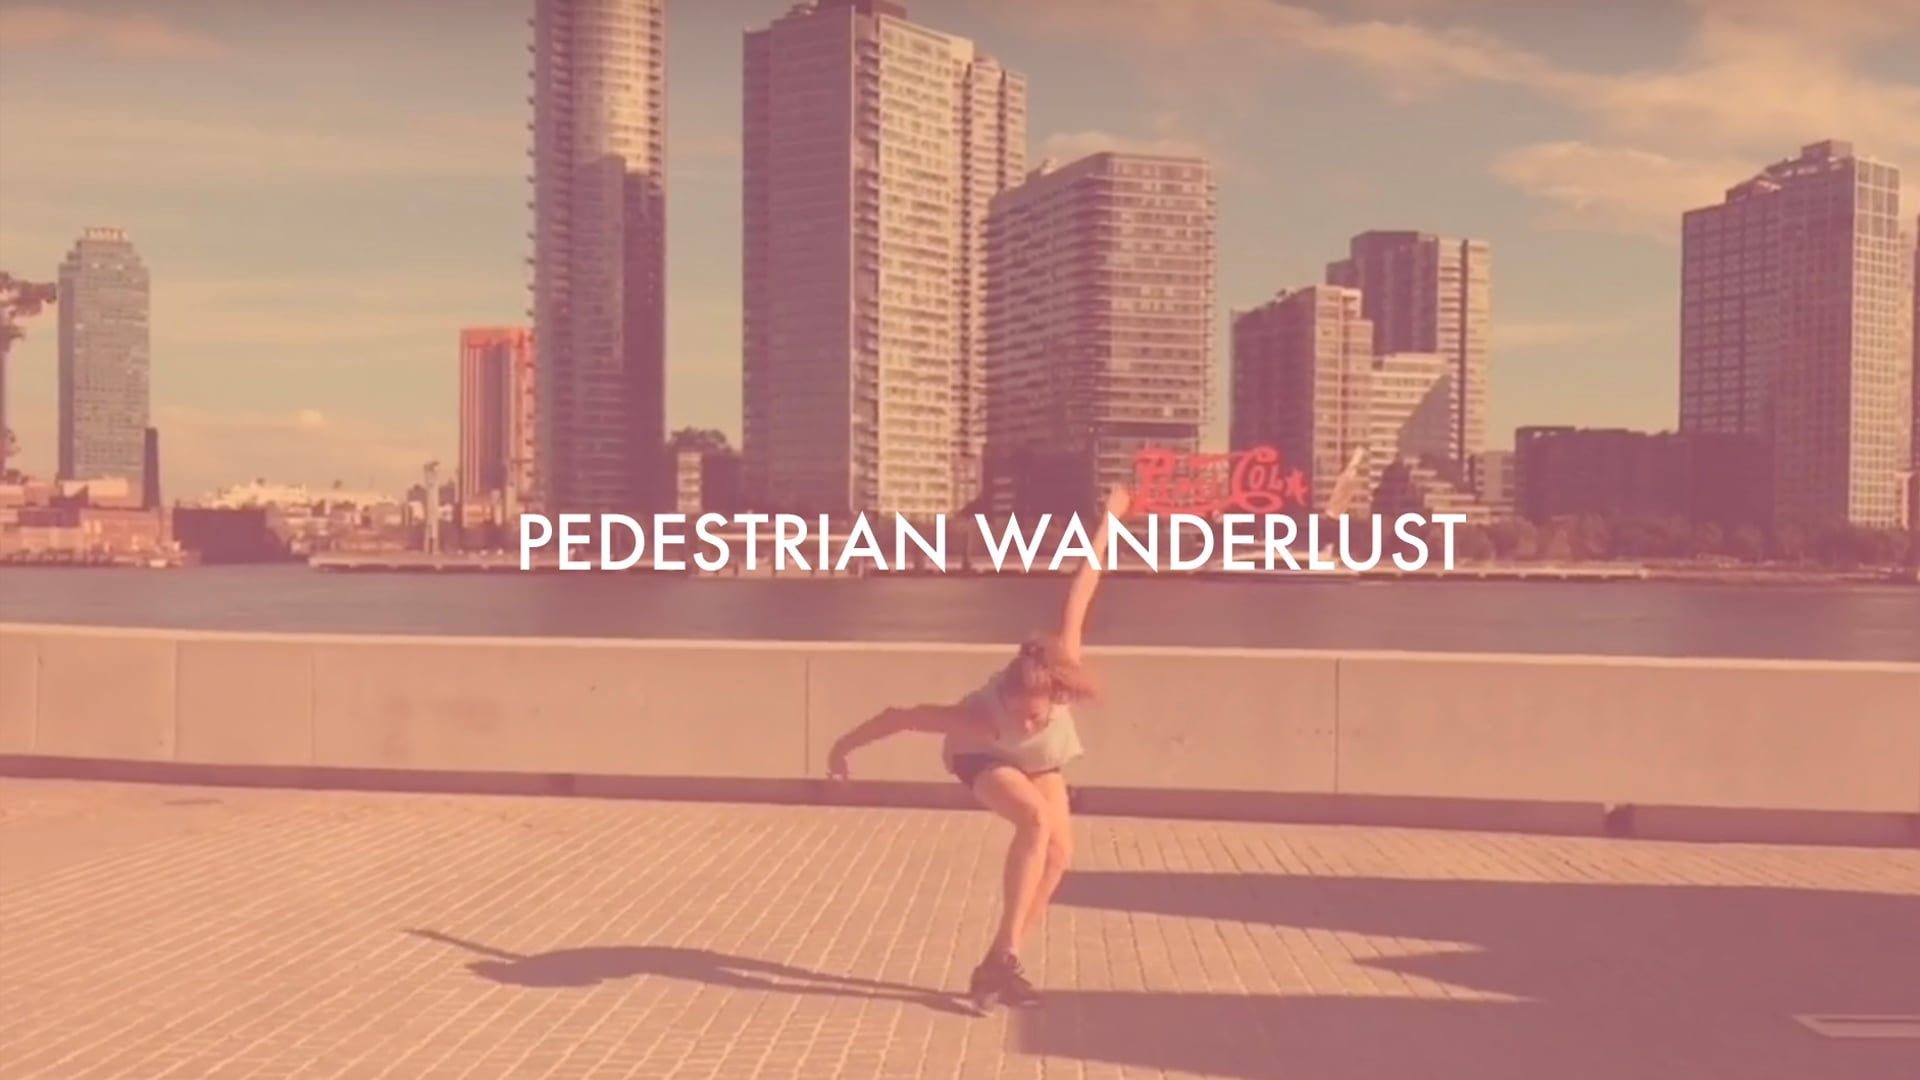 Pedestrian Wanderlust